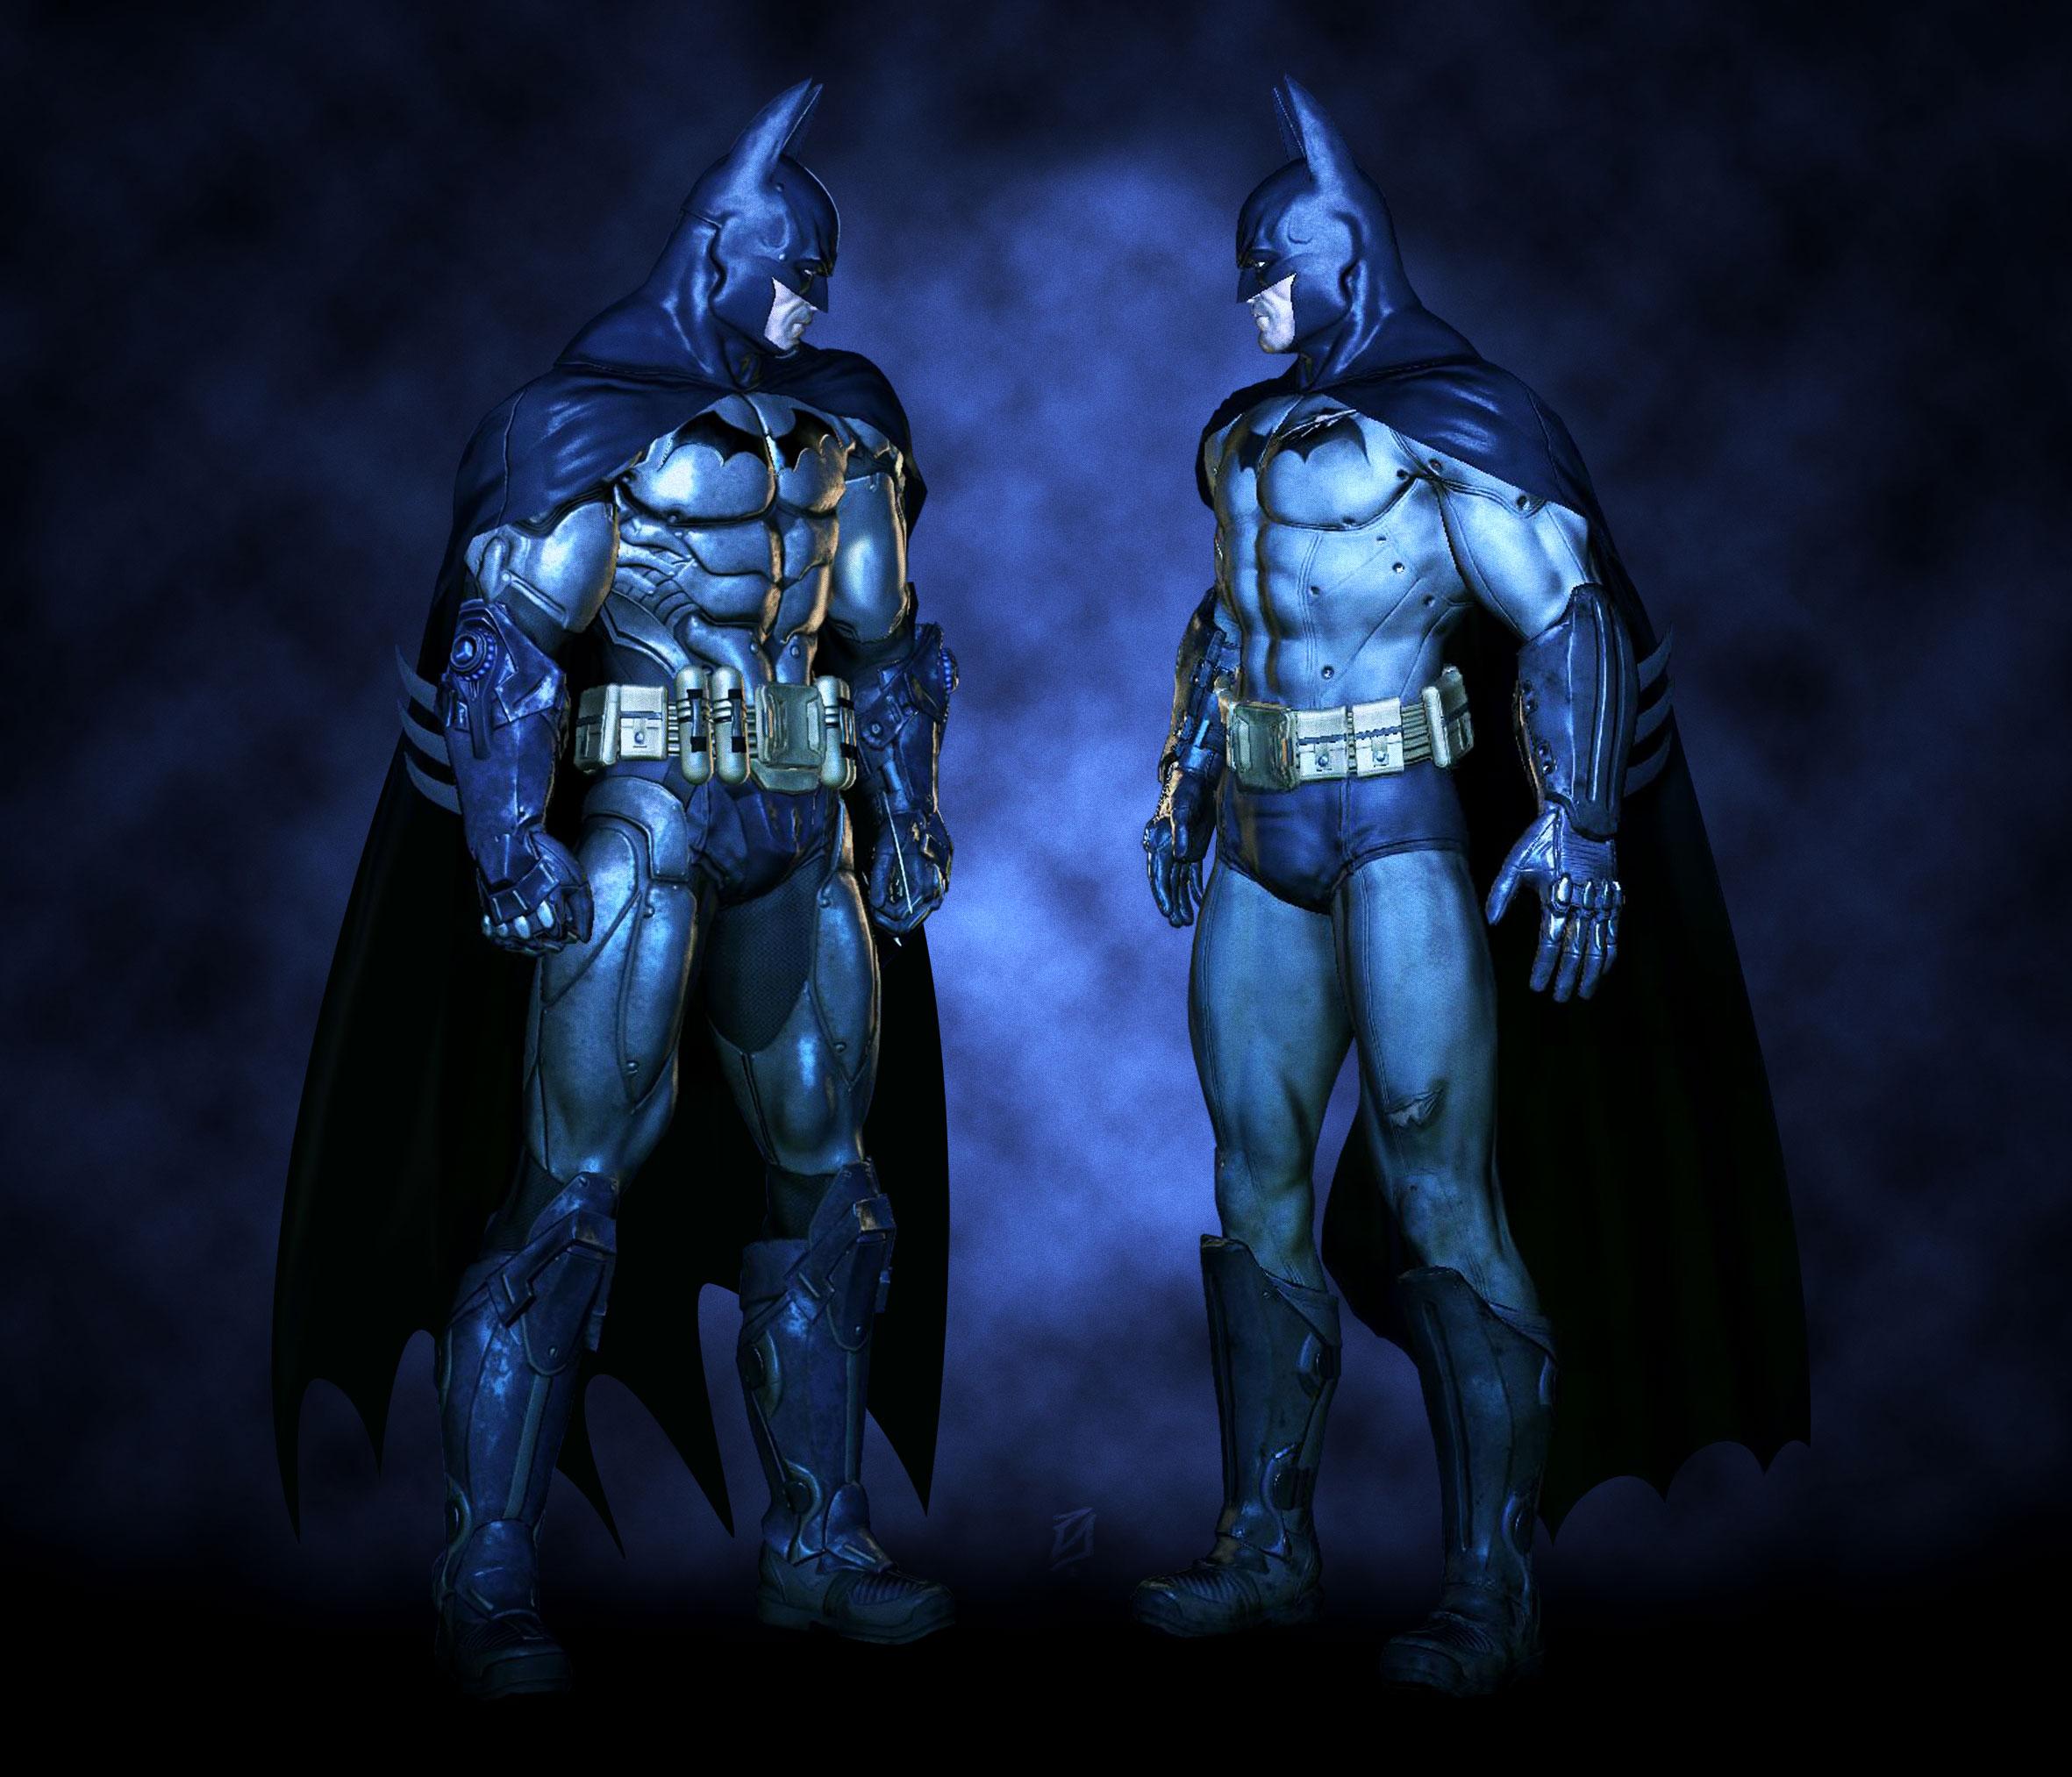 http://fc02.deviantart.net/fs71/f/2009/341/f/8/Batman_Arkham_Asylum_by_patokali.jpg